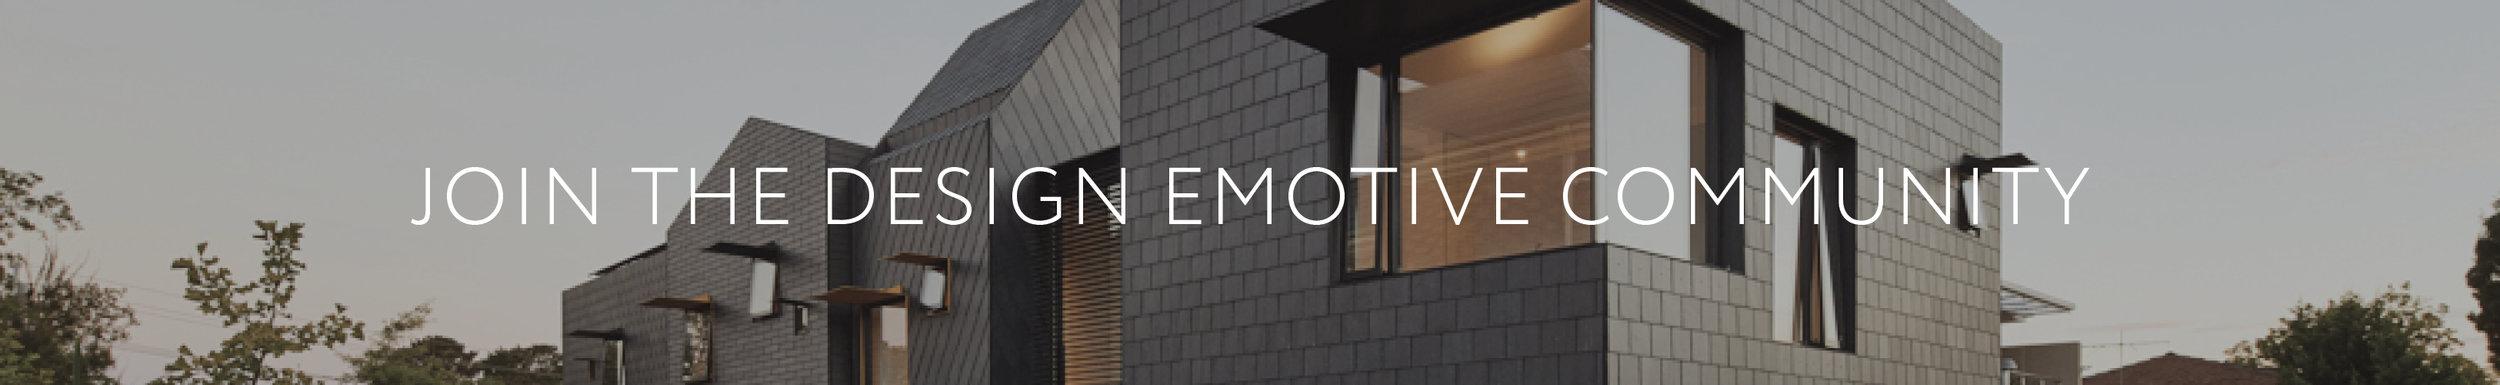 the-design-emotive-charles-house-austin-maynard-architecture-melbourne-architecture